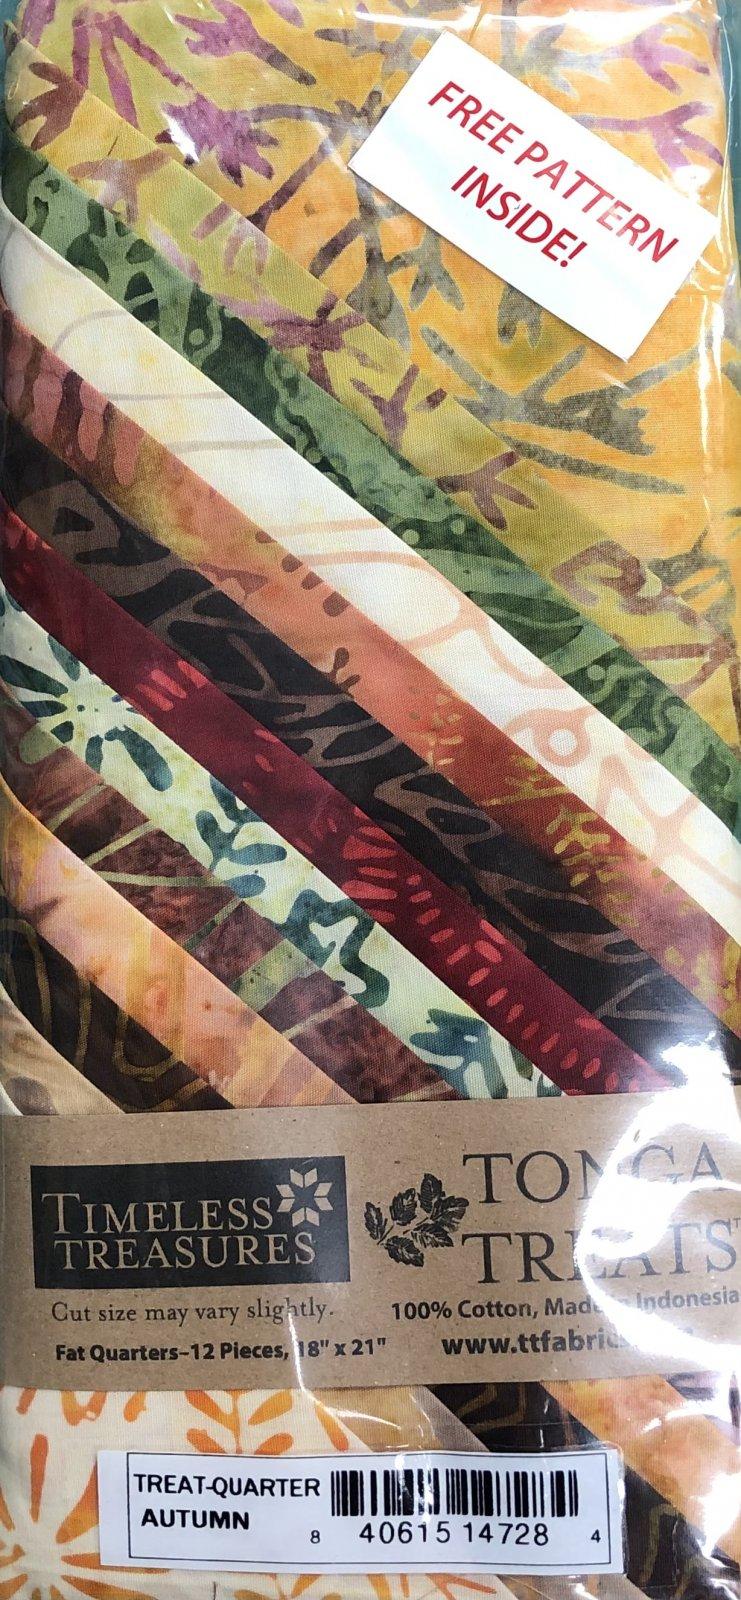 Tonga Treats - 12 Fat Quarters - Autumn